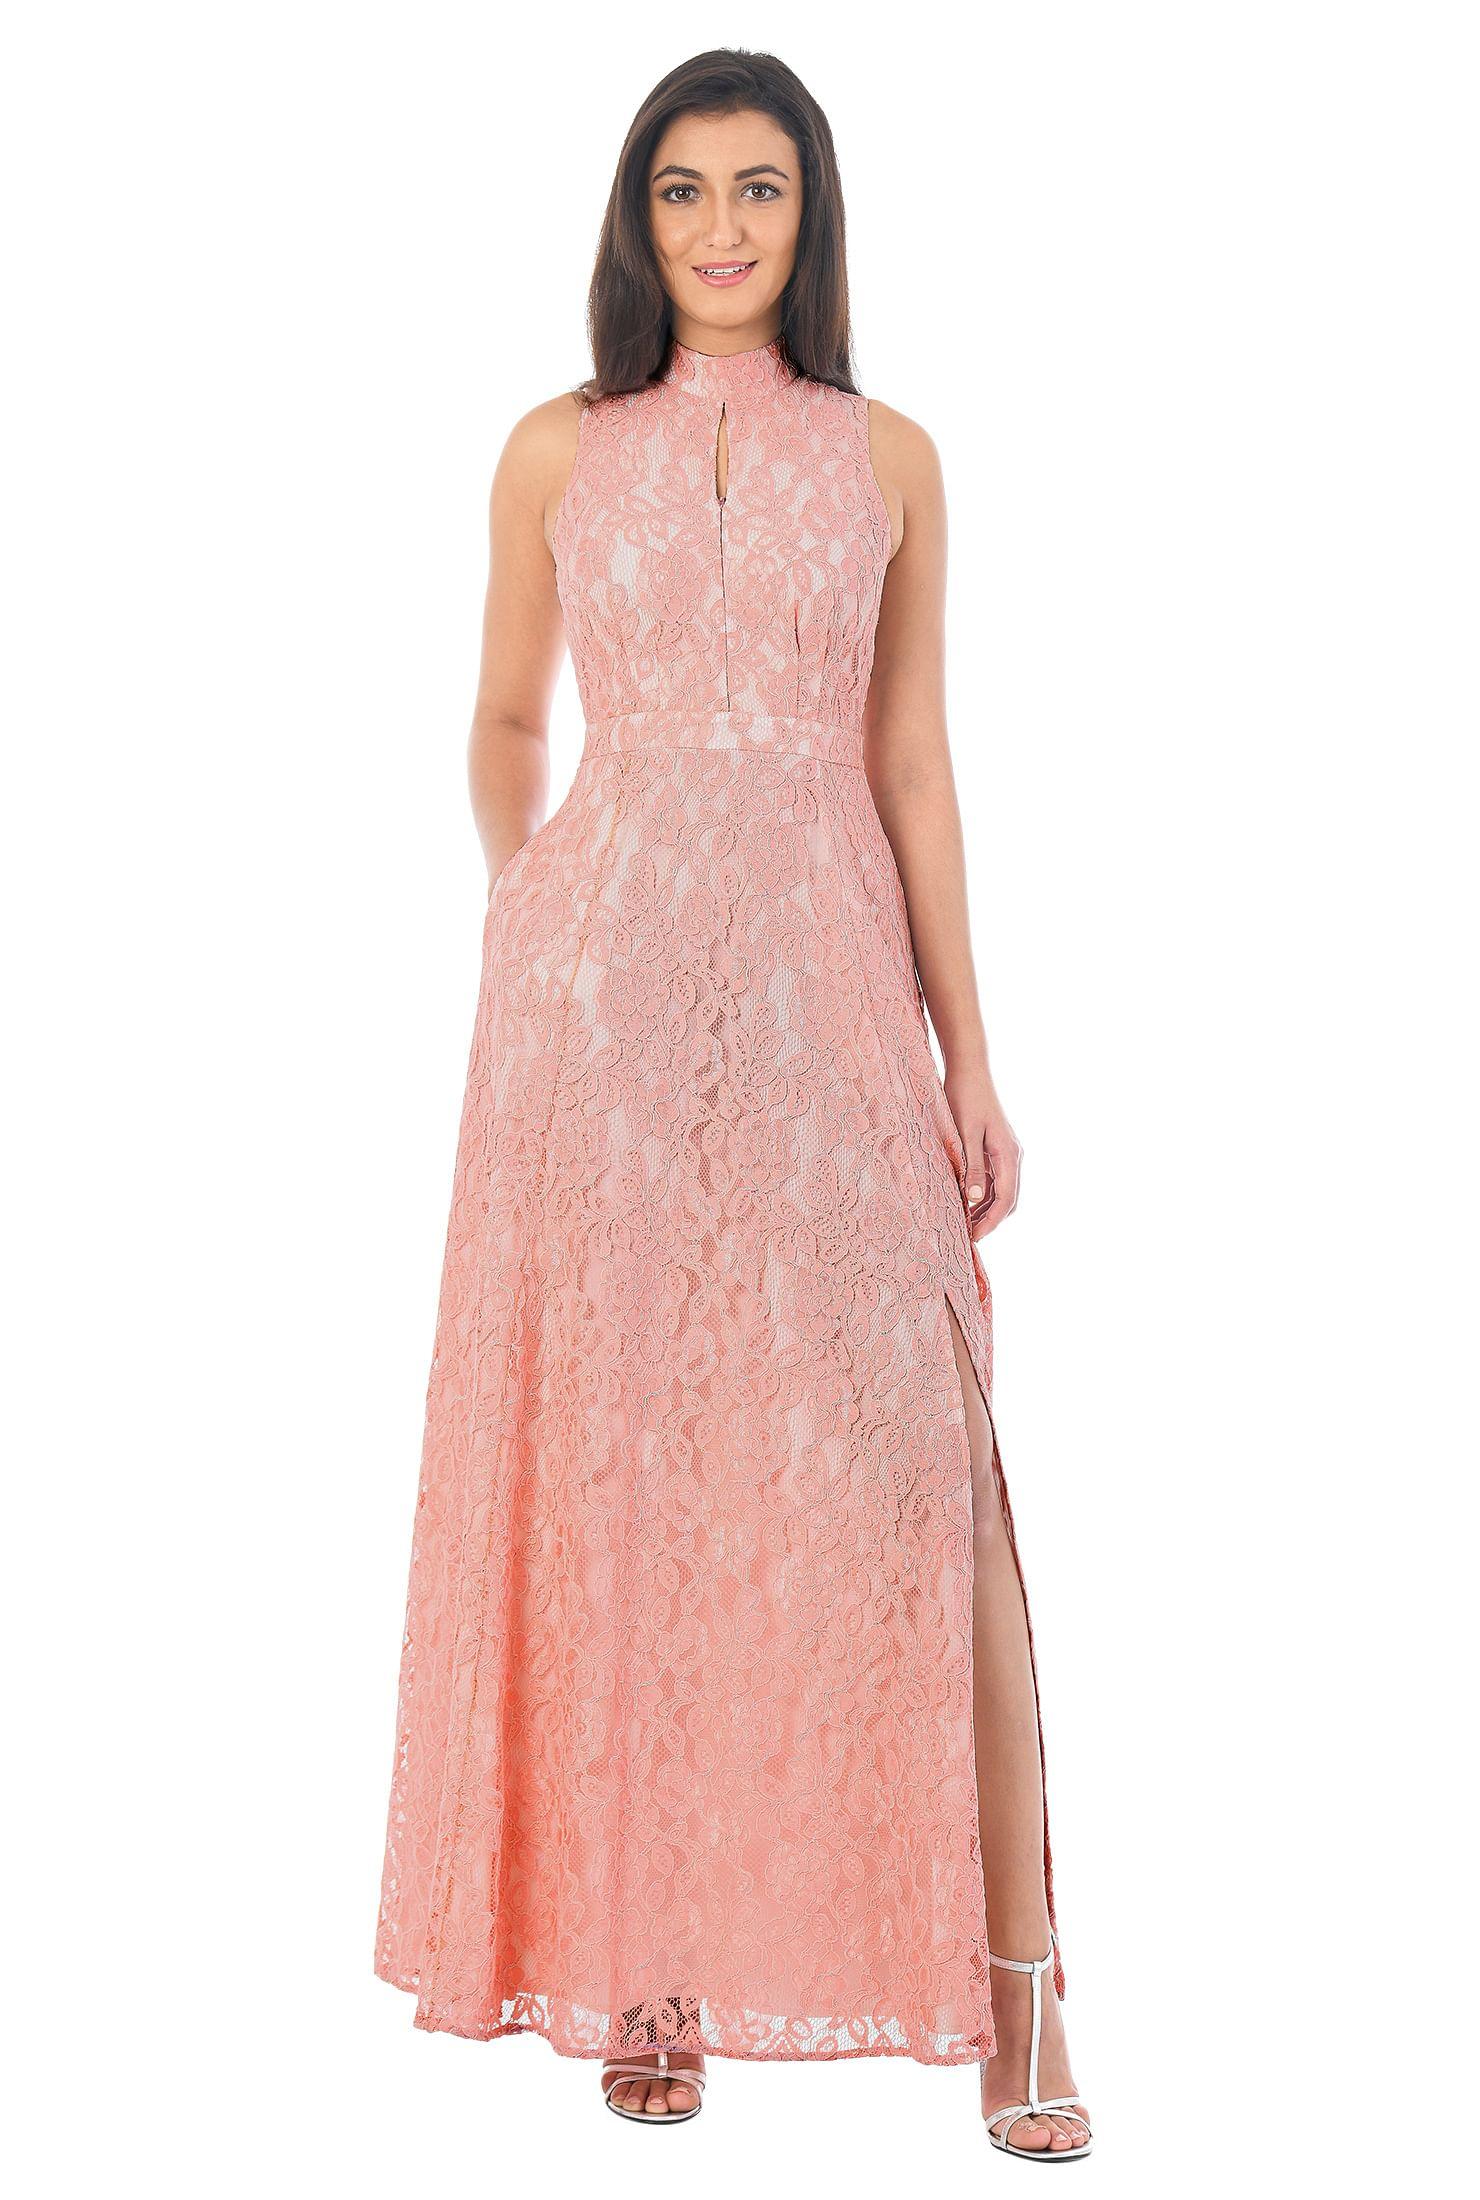 9e4952c4e89 Mock neck keyhole floral lace maxi dress